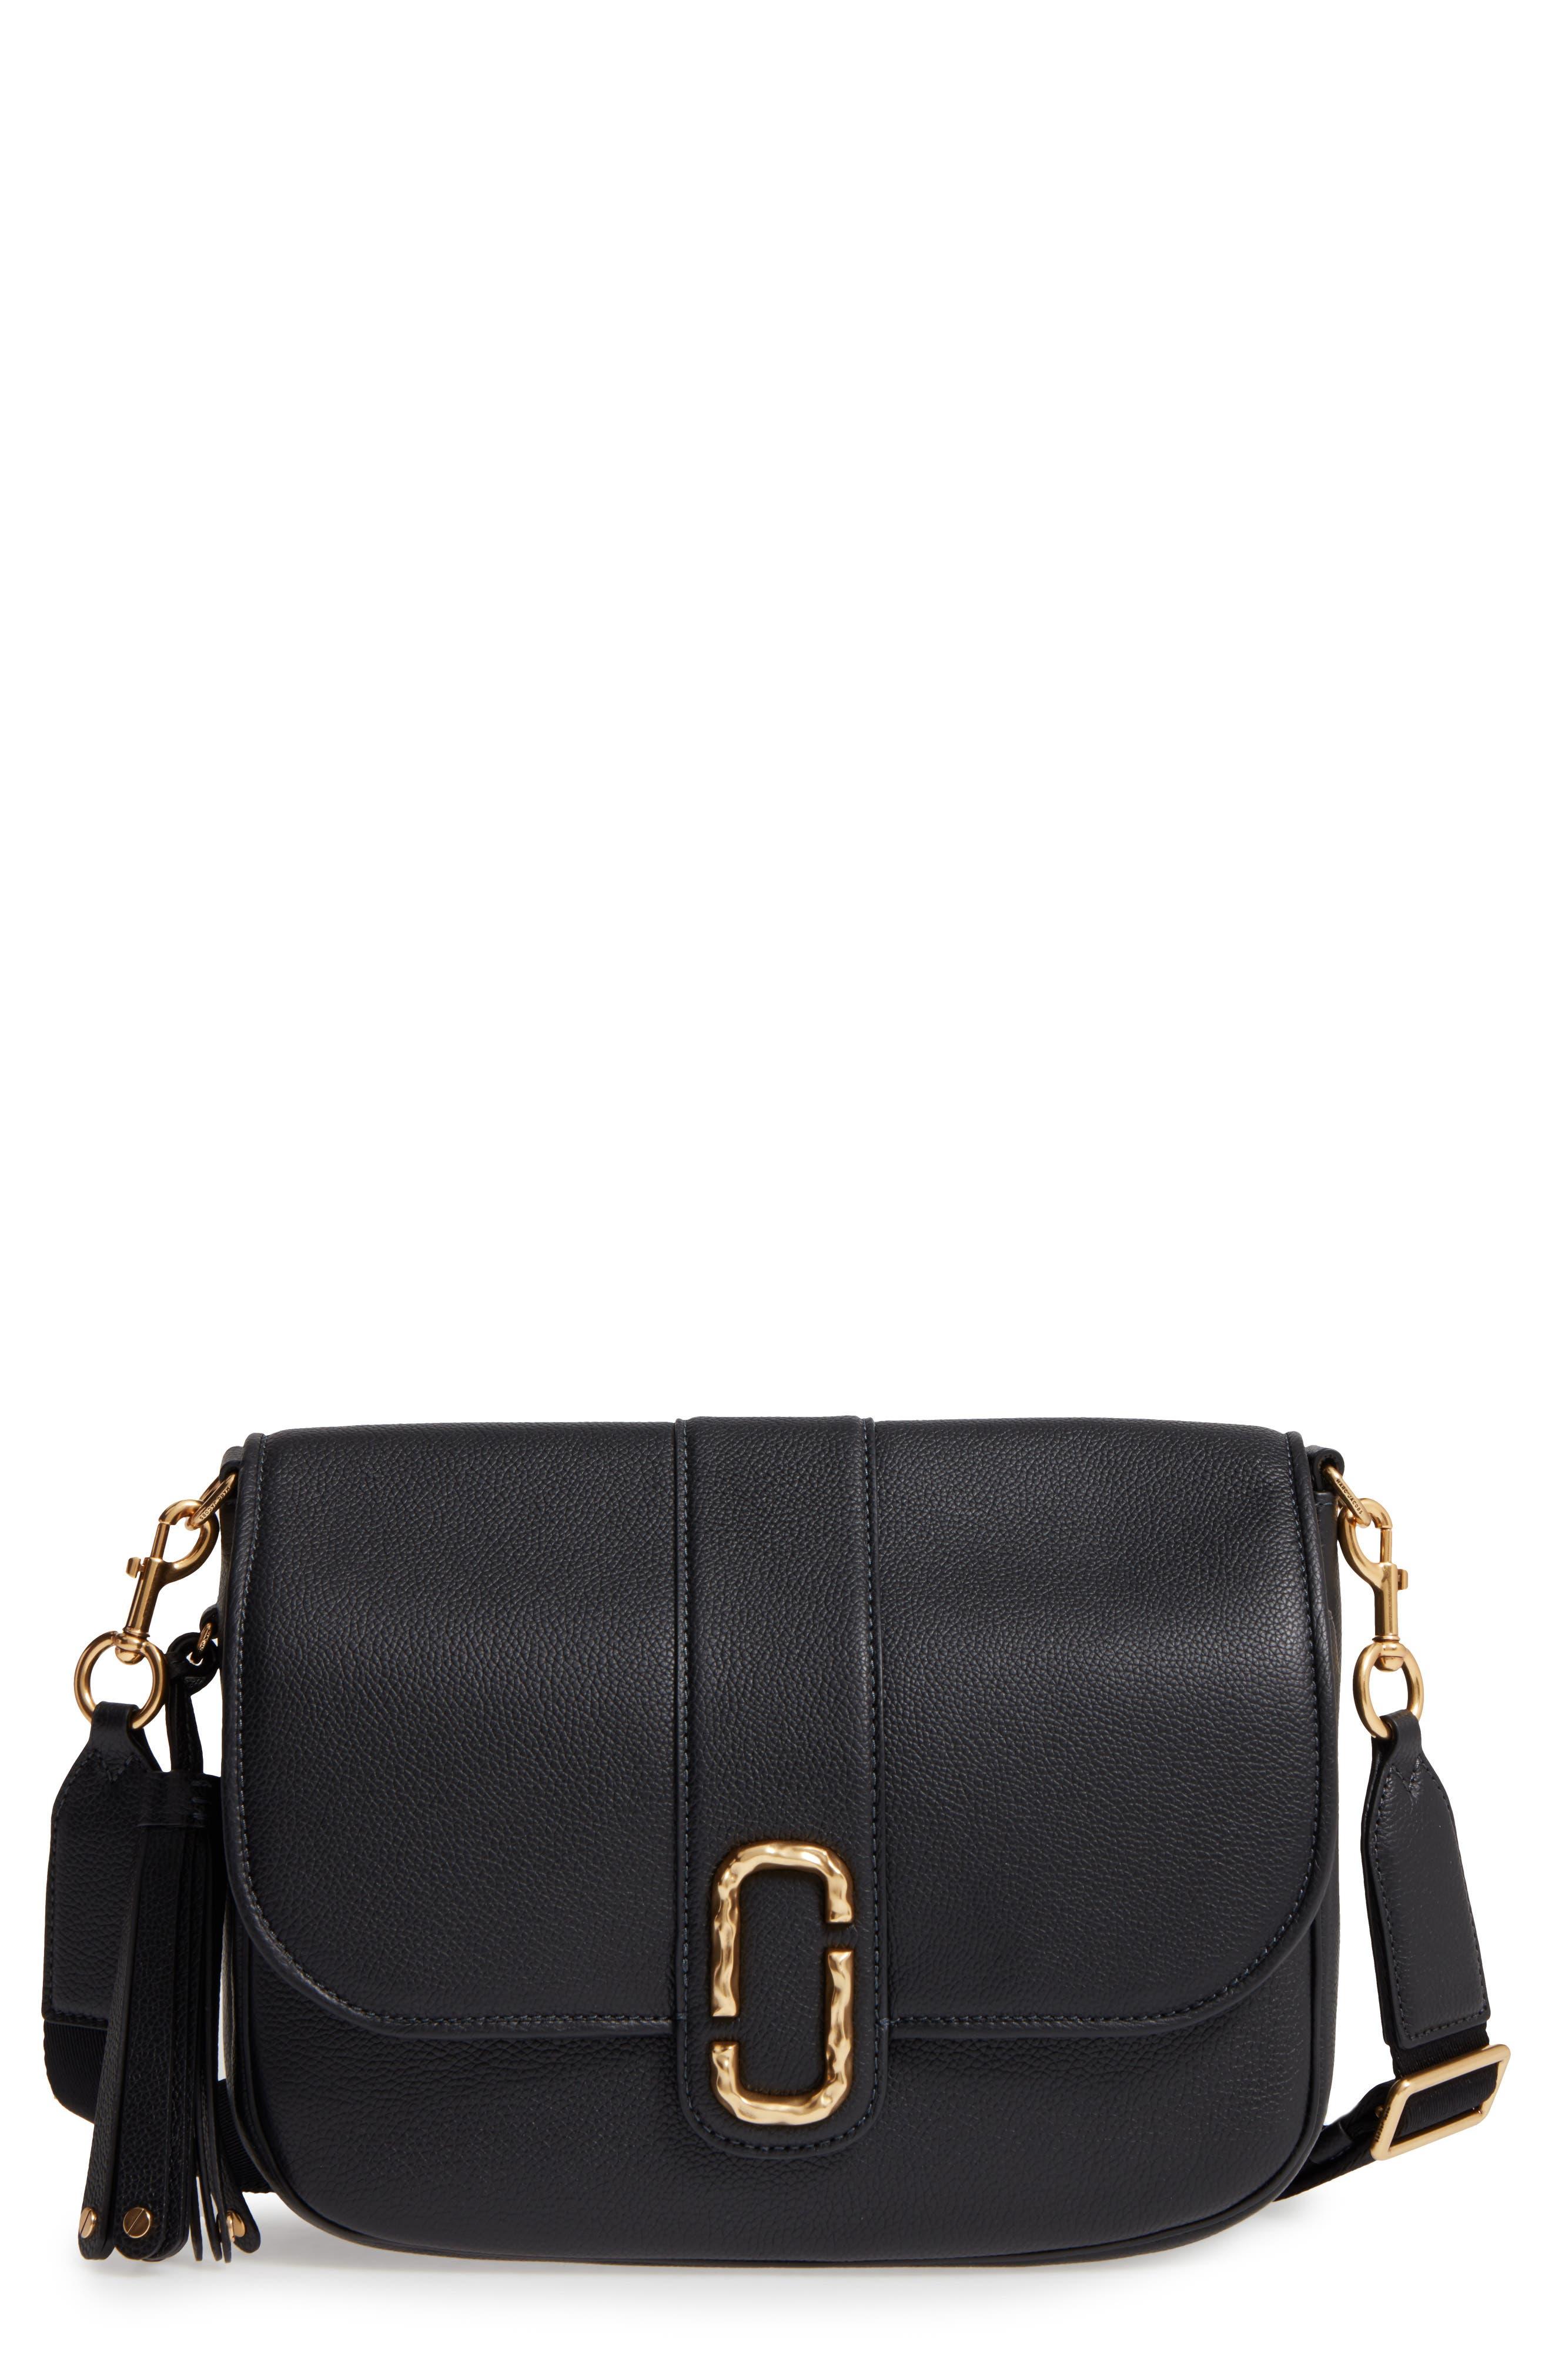 Interlock Leather Crossbody Bag,                         Main,                         color, 001